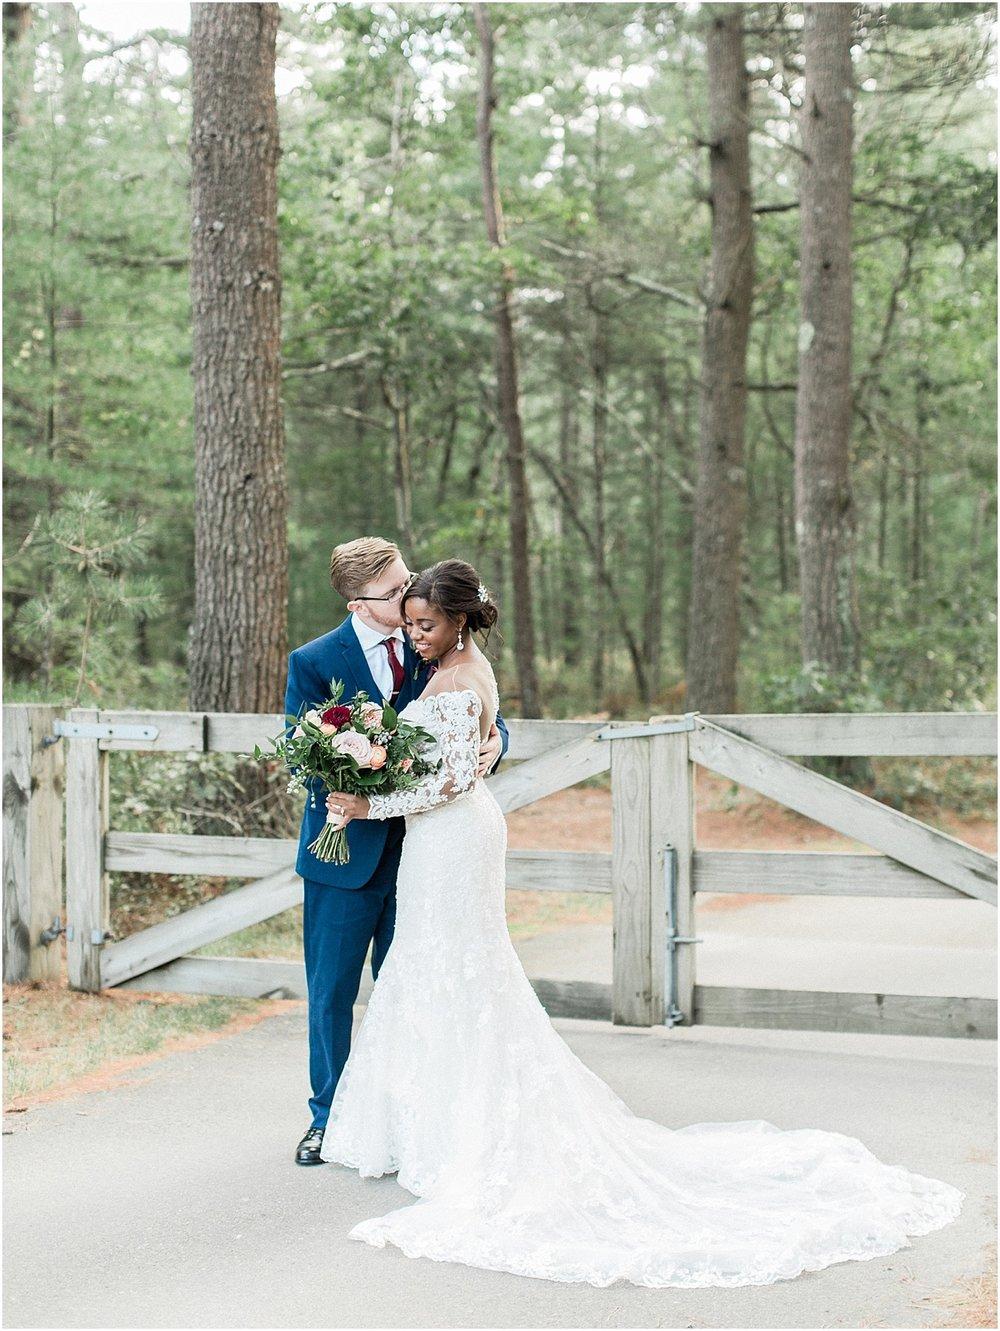 melissa_dan_the_pavilion_at_pine_hills_fall_wine_cape_cod_boston_wedding_photographer_meredith_jane_photography_photo_1194.jpg